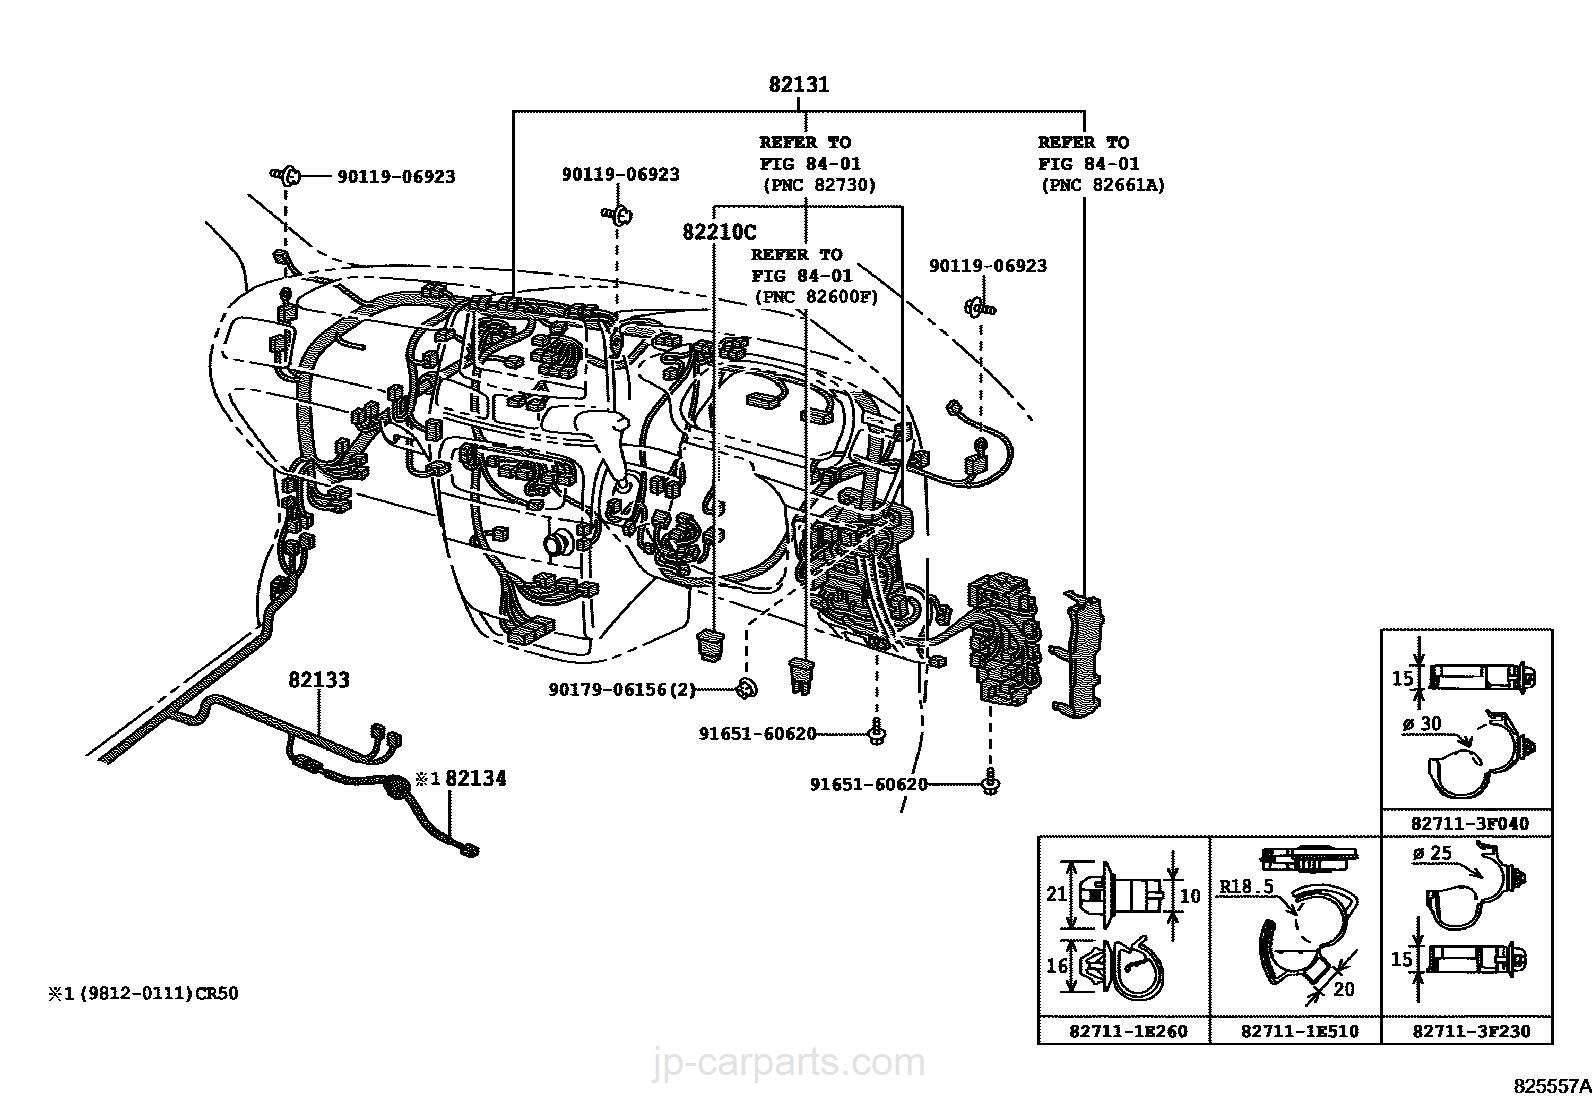 WIRING & CLAMP / toyota   part list JP-CarParts.com